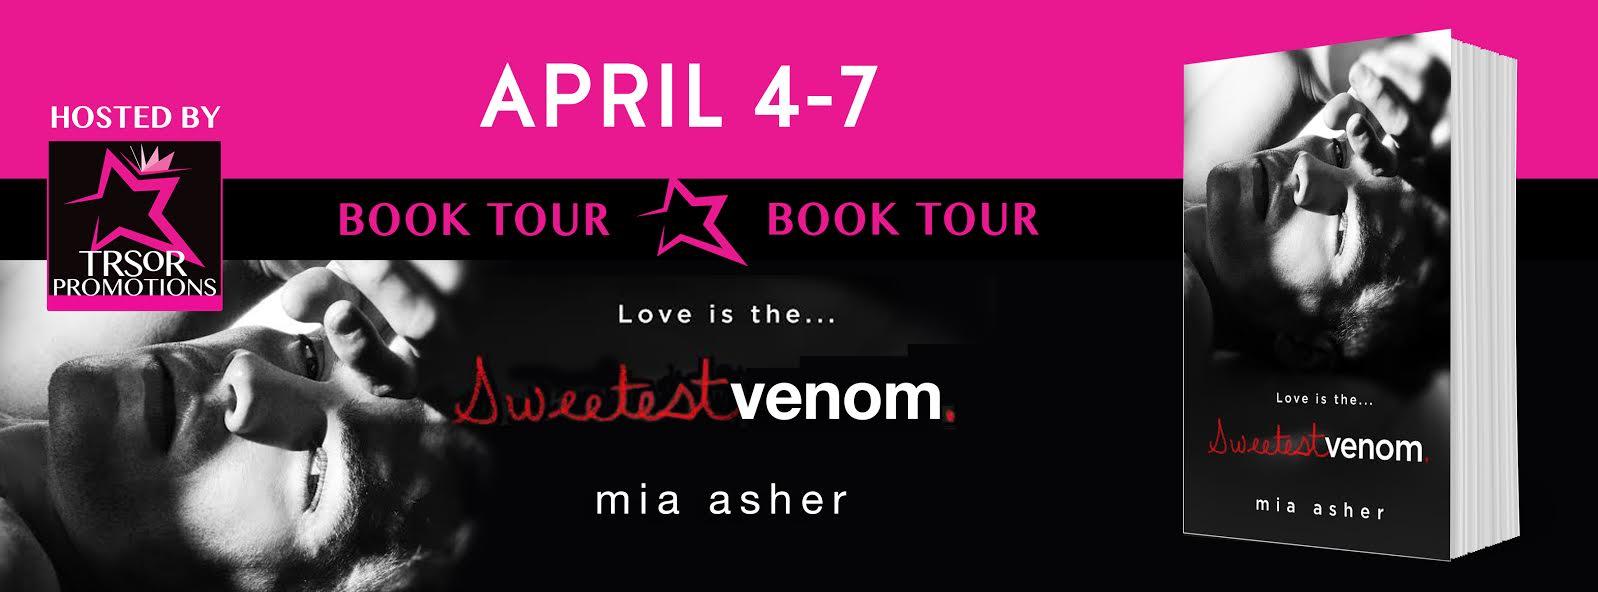 book tour sv.jpg